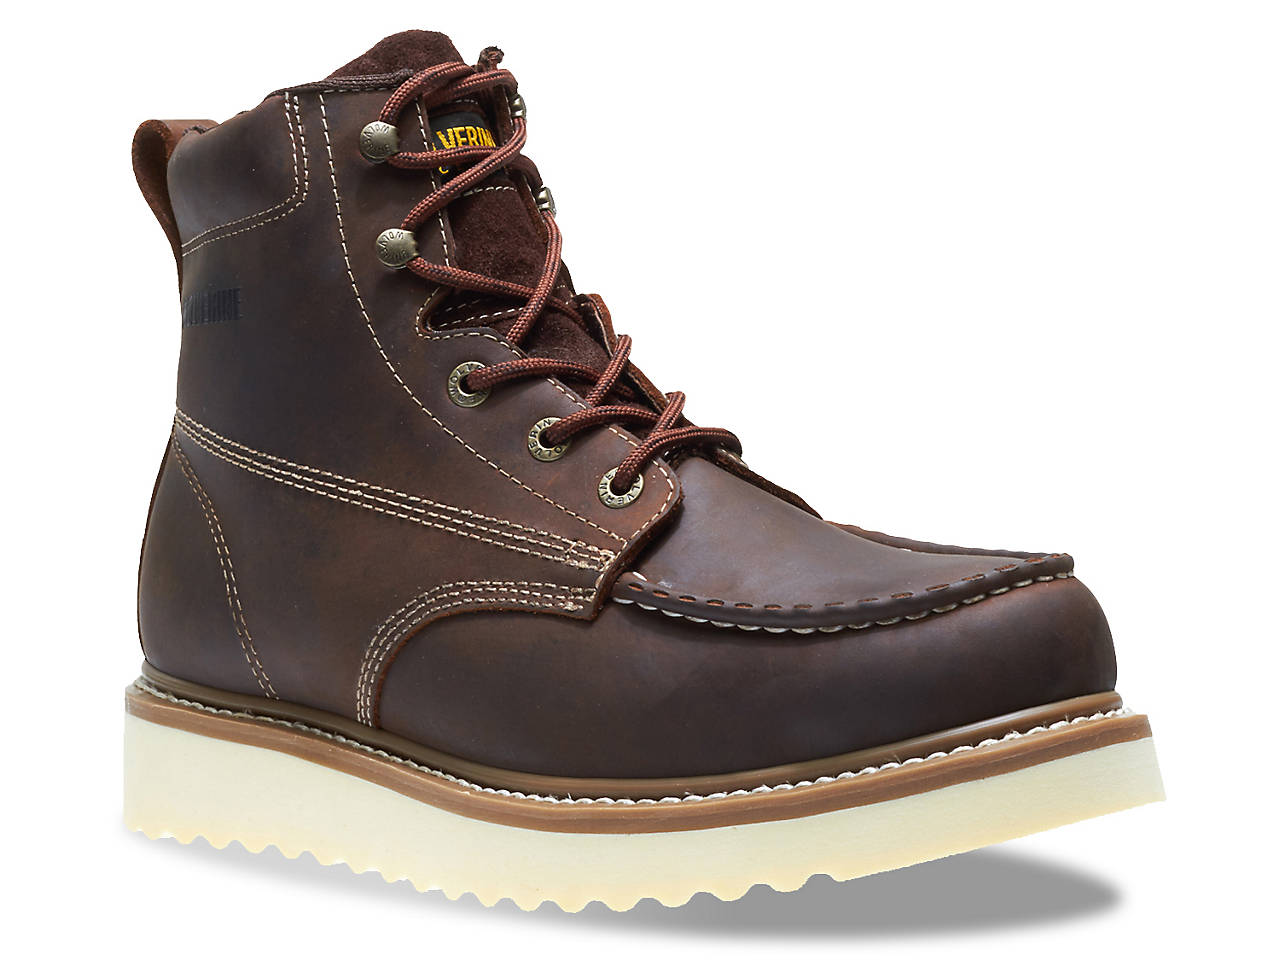 d91beba3cf7 Loader Steel Toe Work Boot